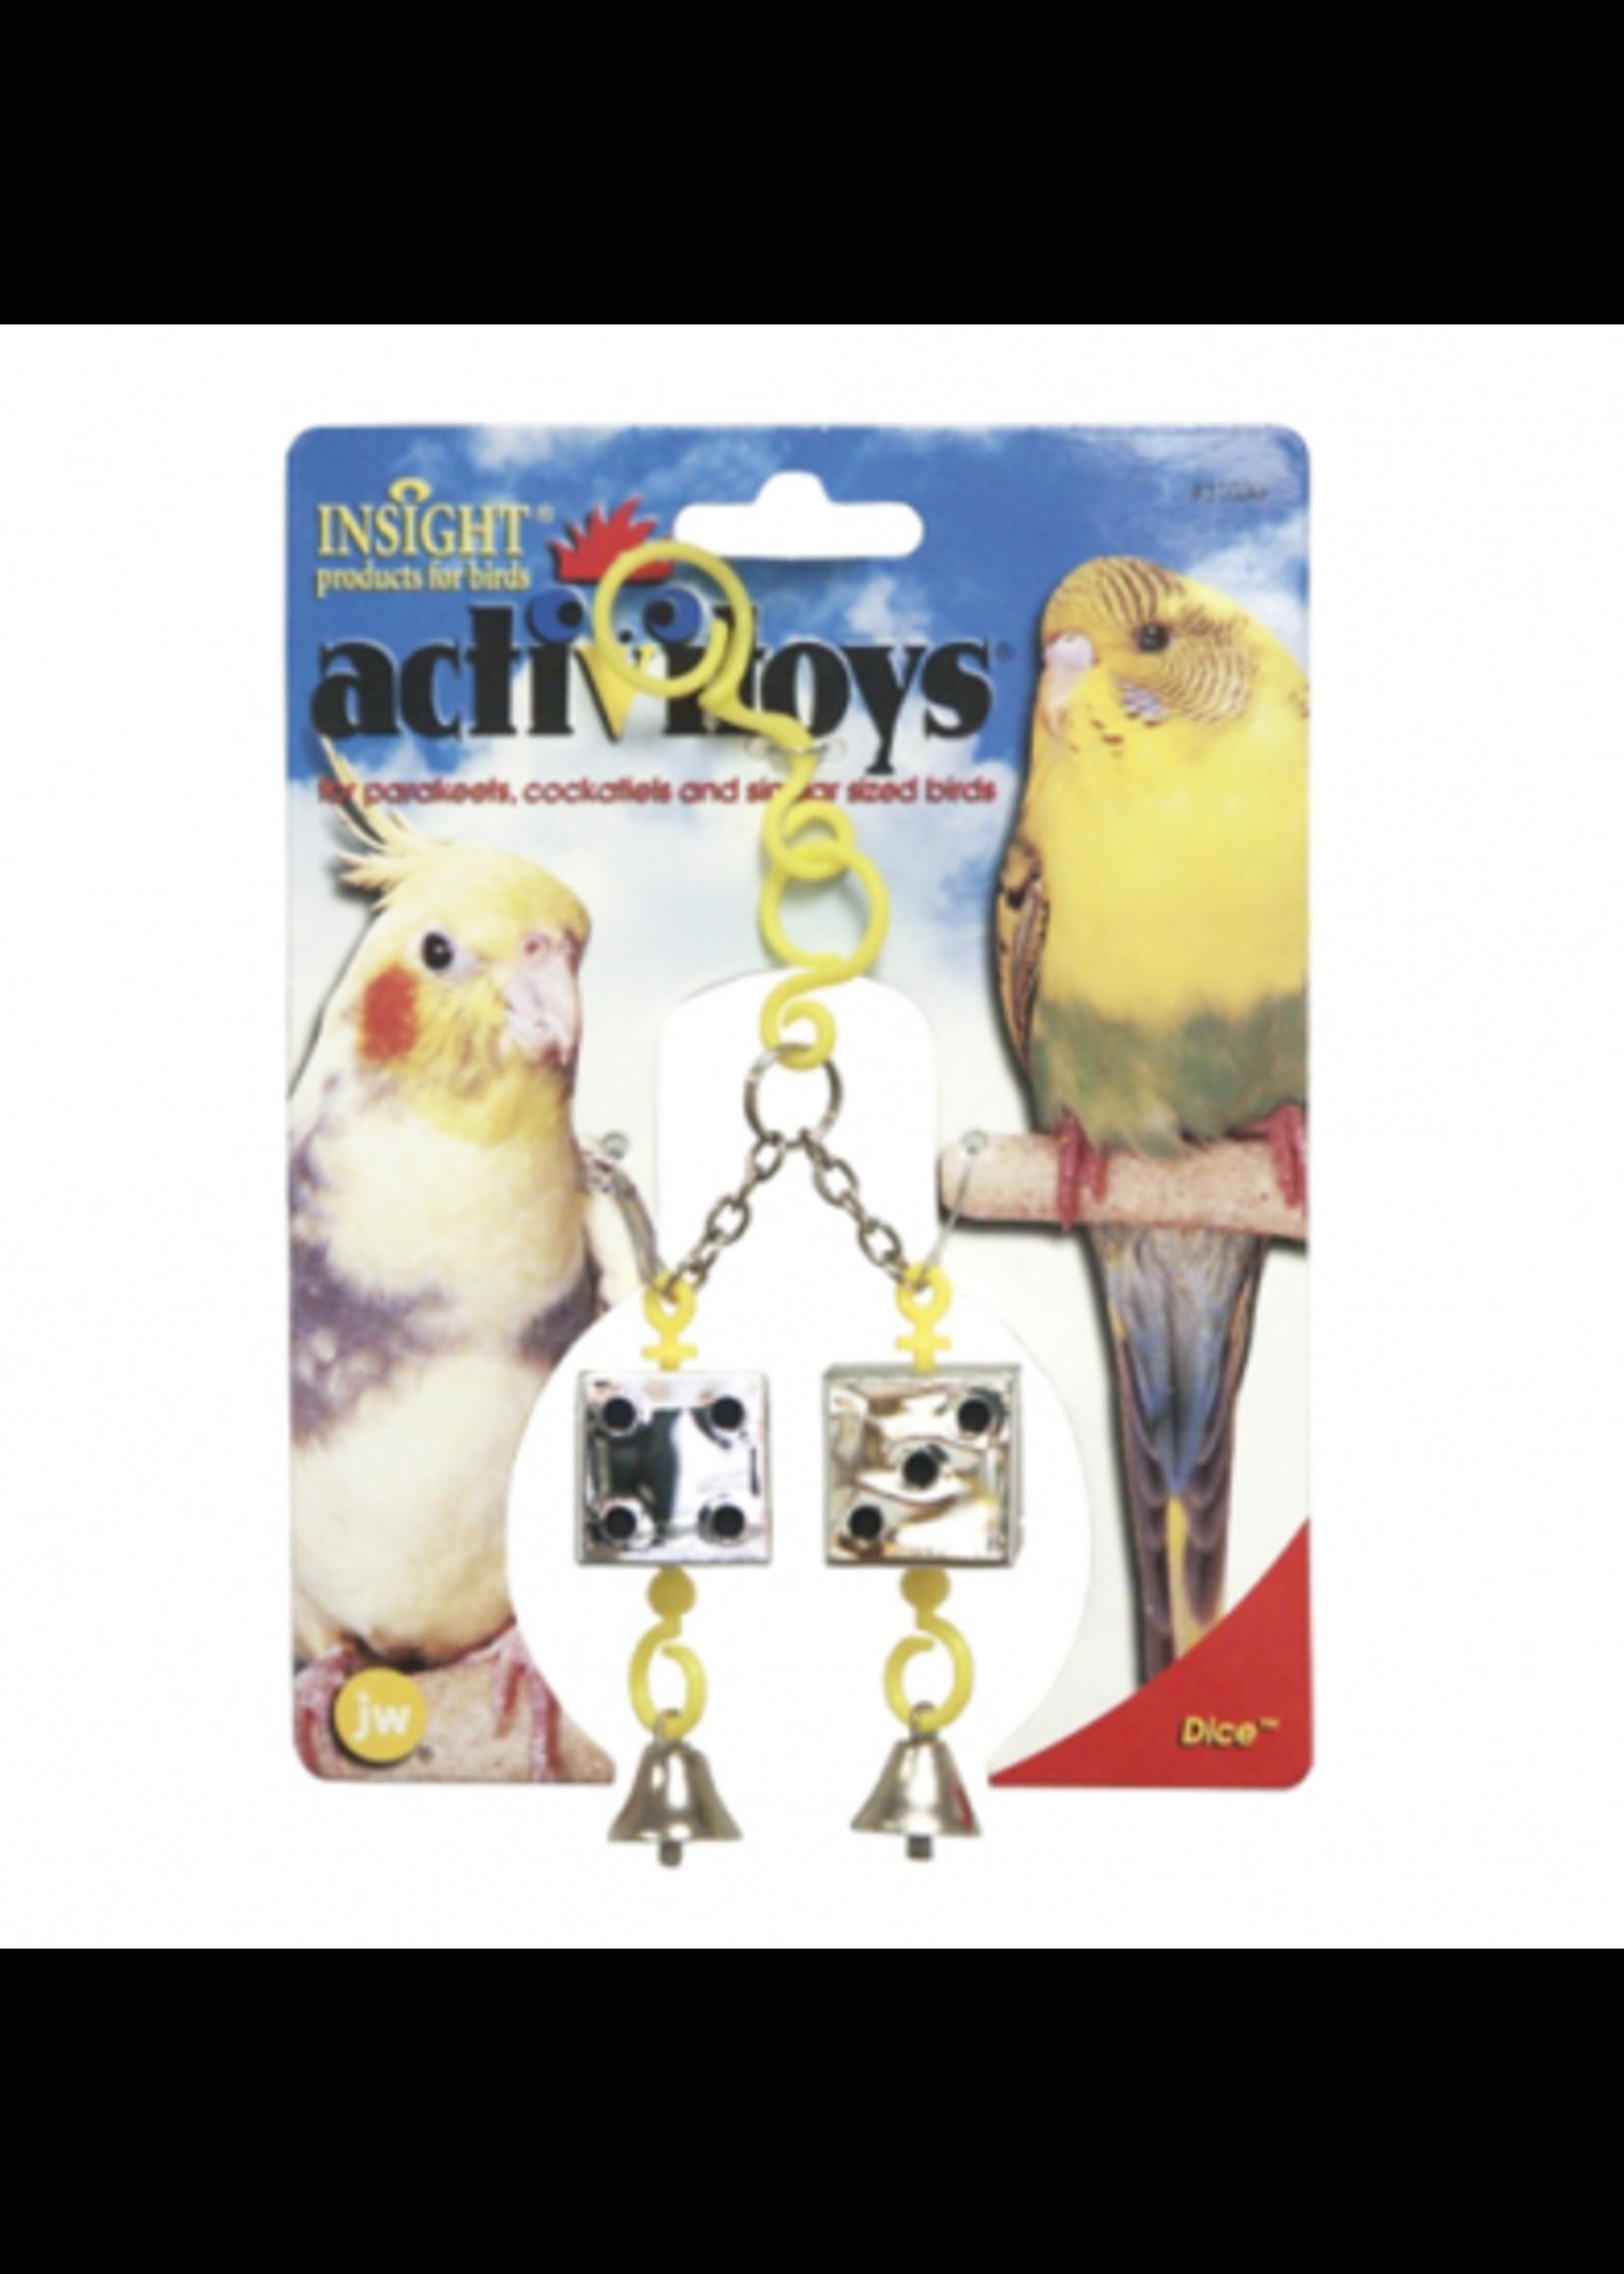 JW JW / ActiviToy Bird / Dice